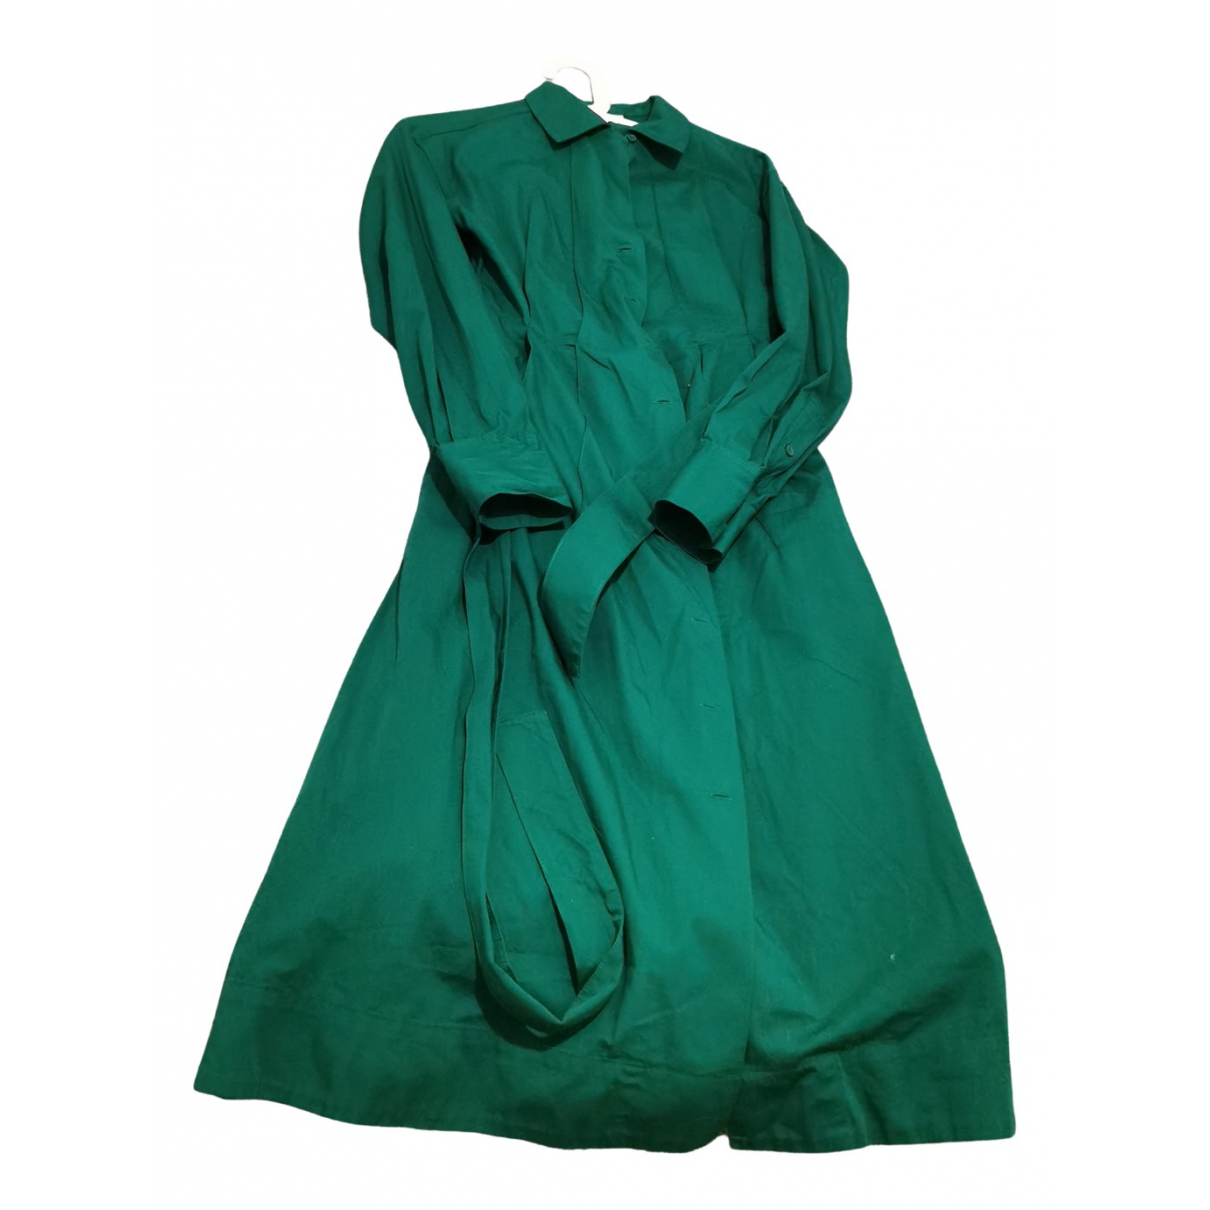 Lemaire X Uniqlo \N Kleid in  Gruen Baumwolle